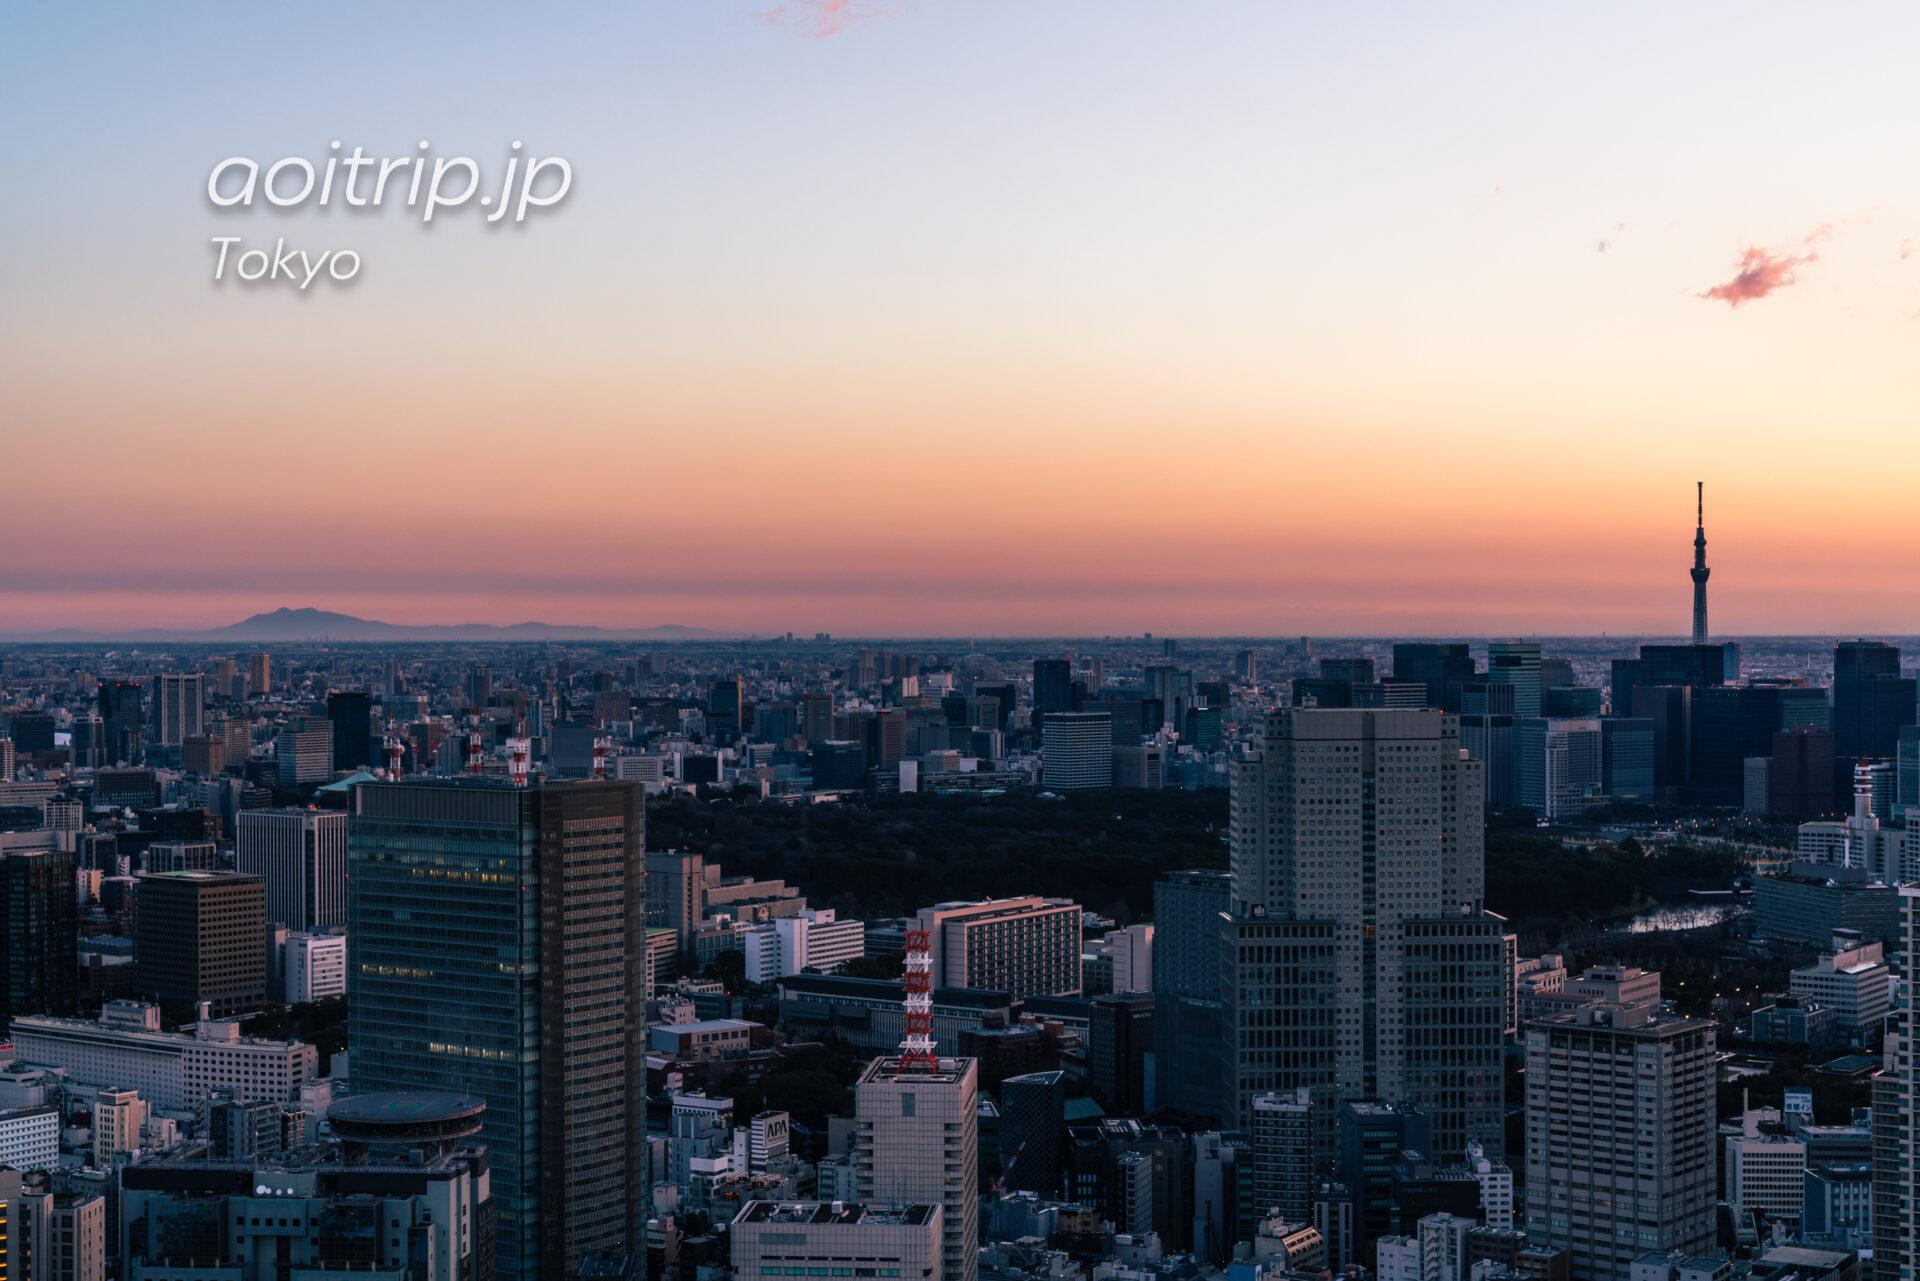 Tokyo Skyline ザ リッツカールトン東京から望む早朝の筑波山と東京スカイツリー